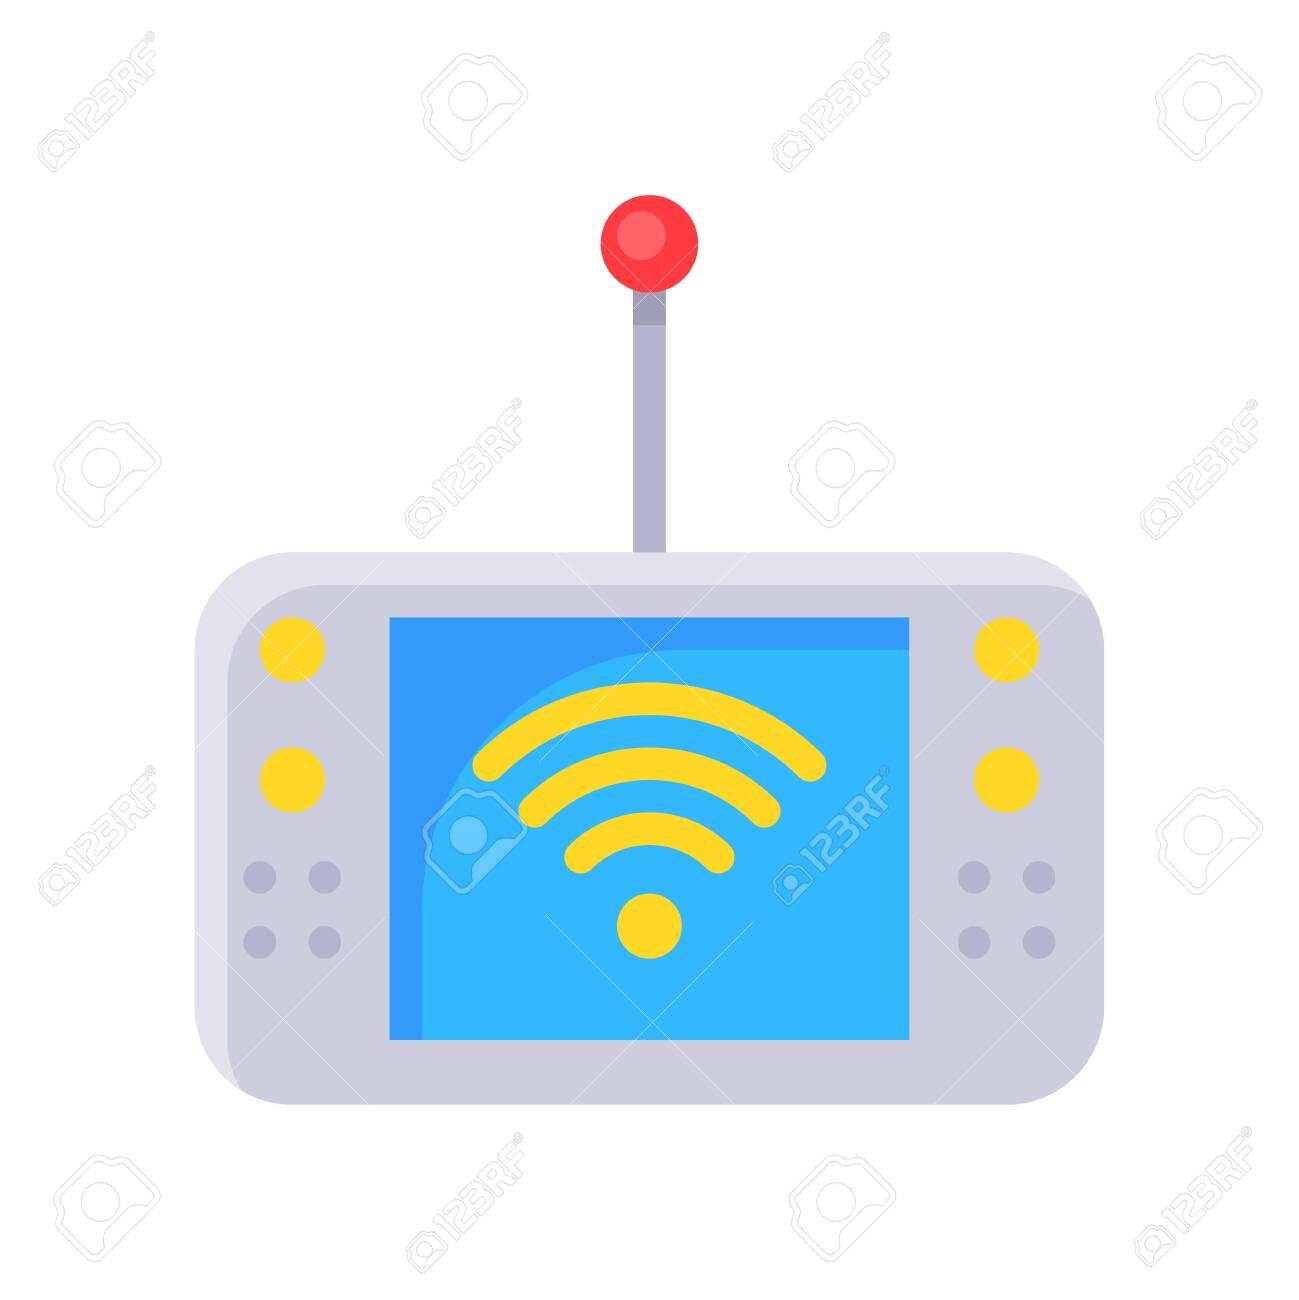 Mobile Internet device vector illustration, Future technology flat design icon - 136139984